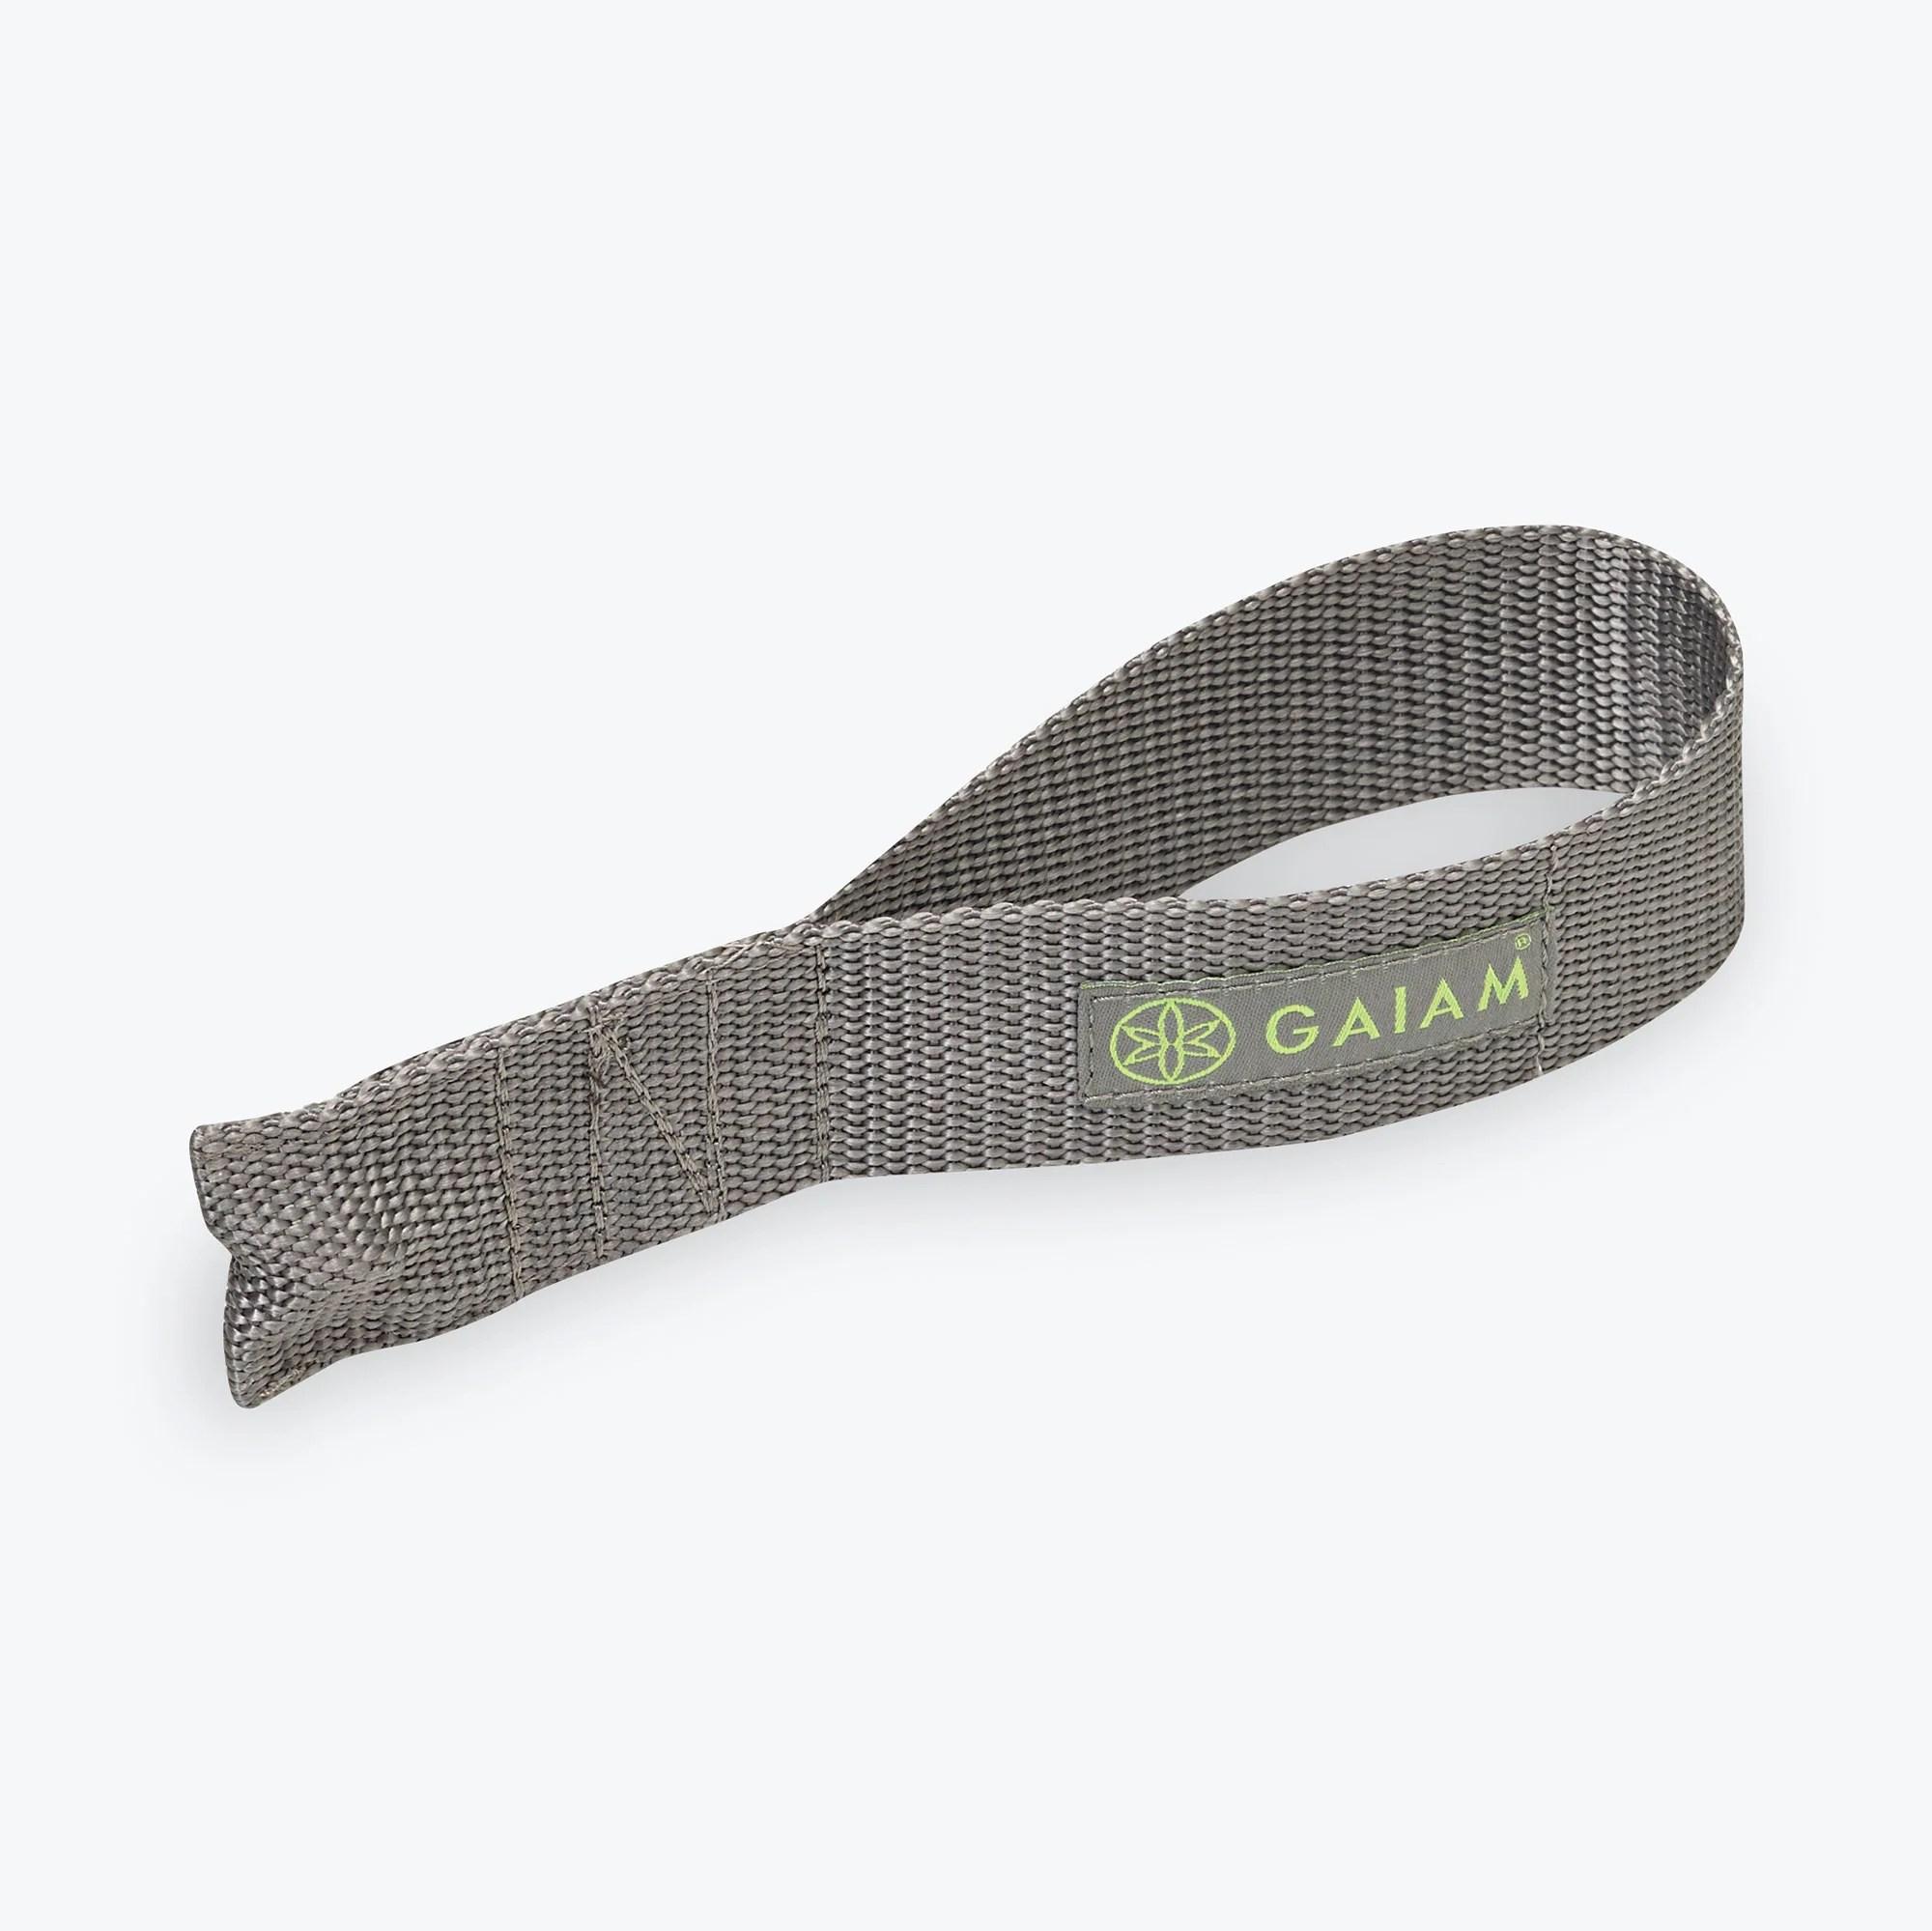 Resistance Cord & Door Attachment Kit - Gaiam